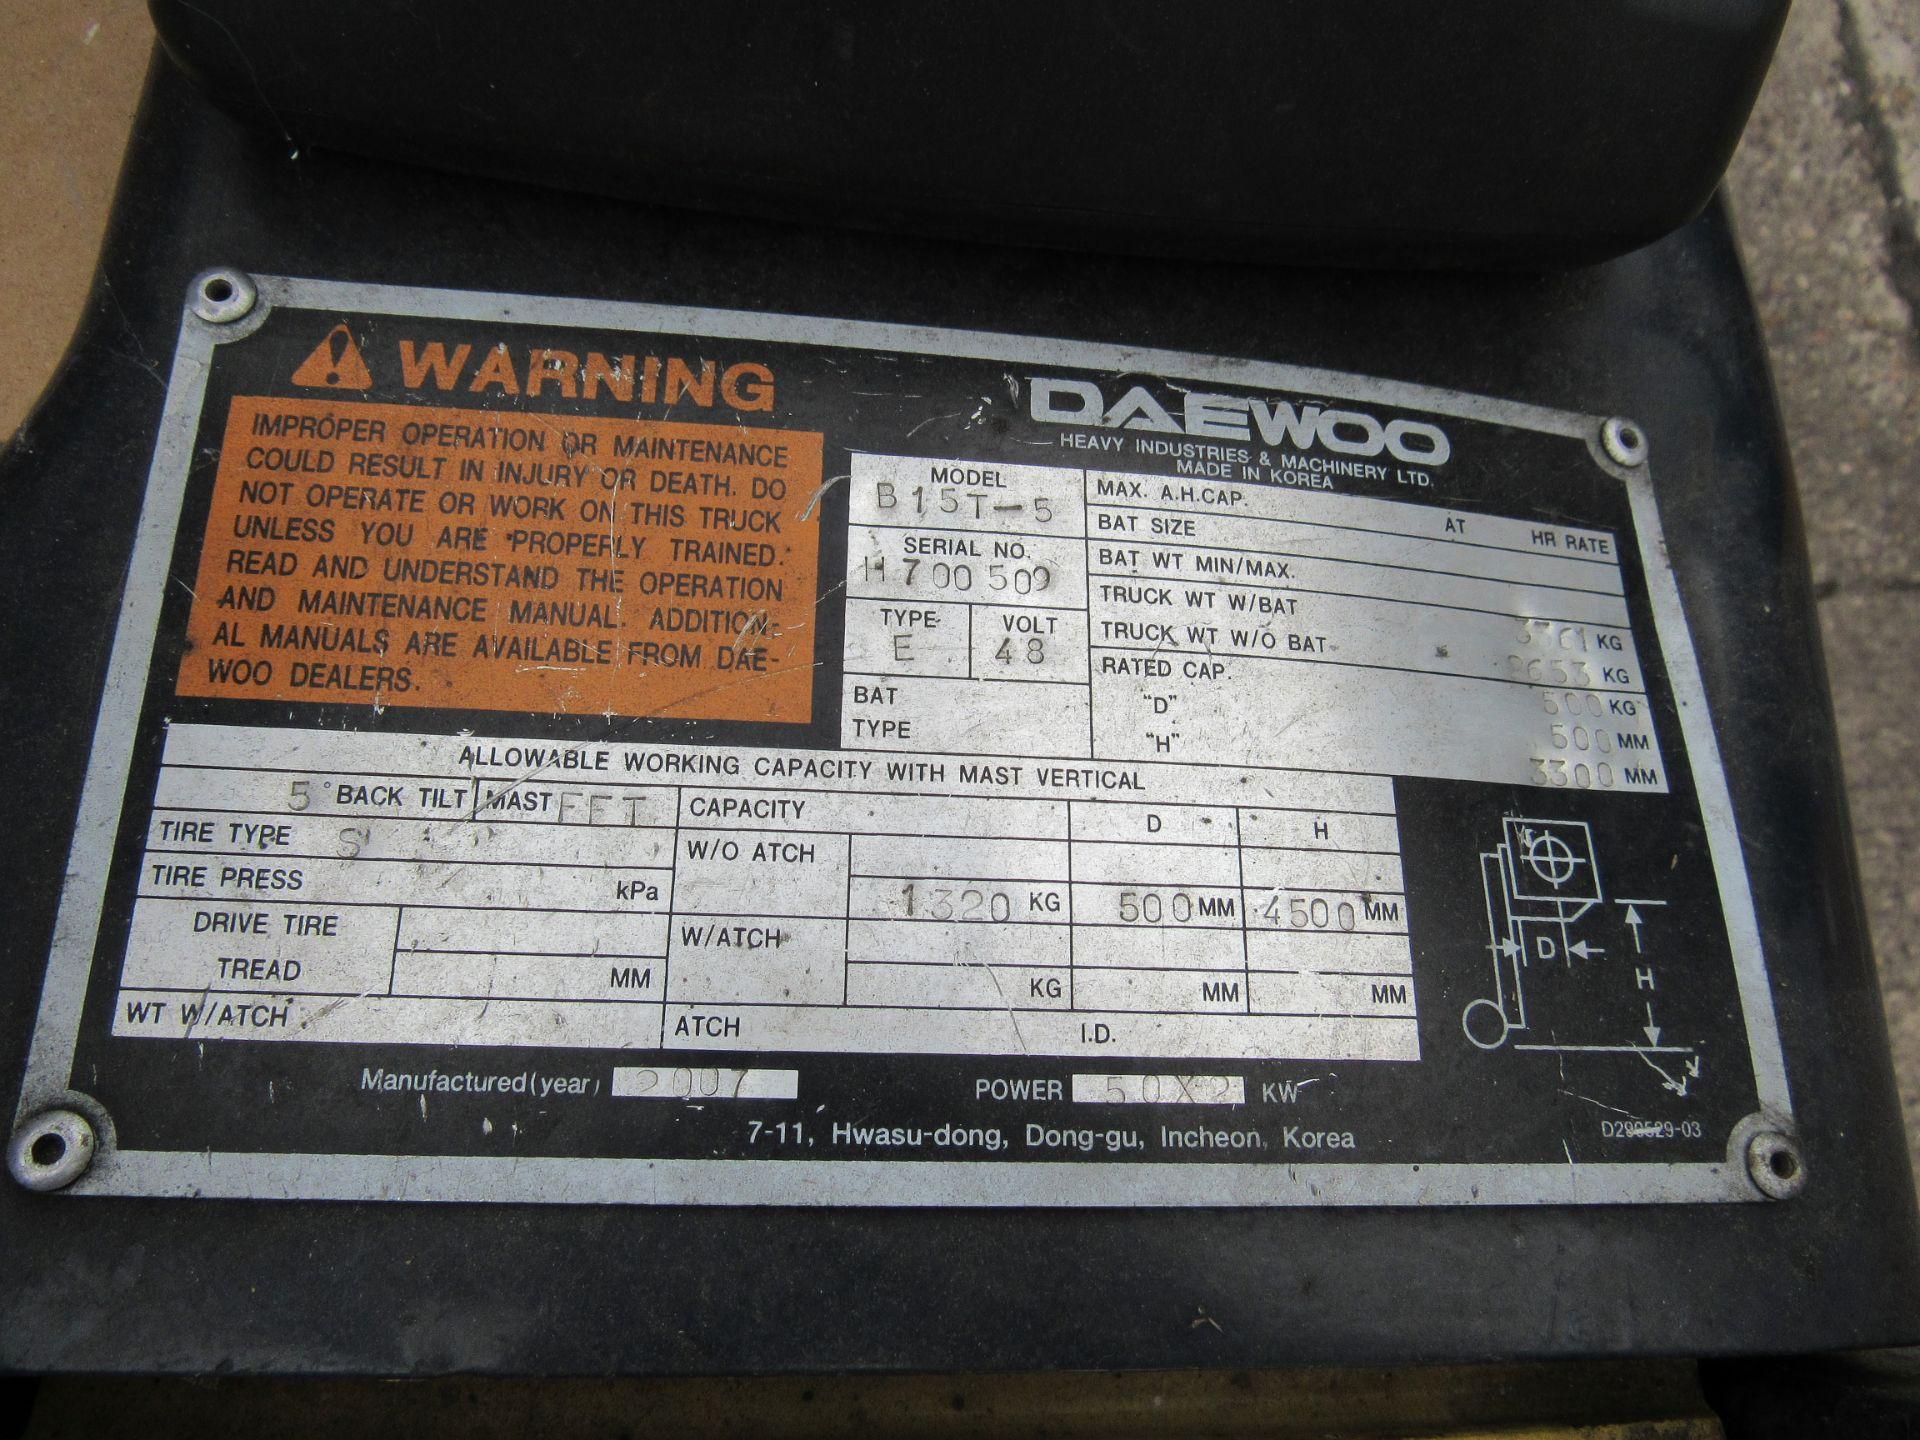 Doosan Daewoo B15T-5 Battery Forklift, 1320kg Capacity, 2278 Hours, Triple Mast, Side Shift, 2007, - Image 18 of 21